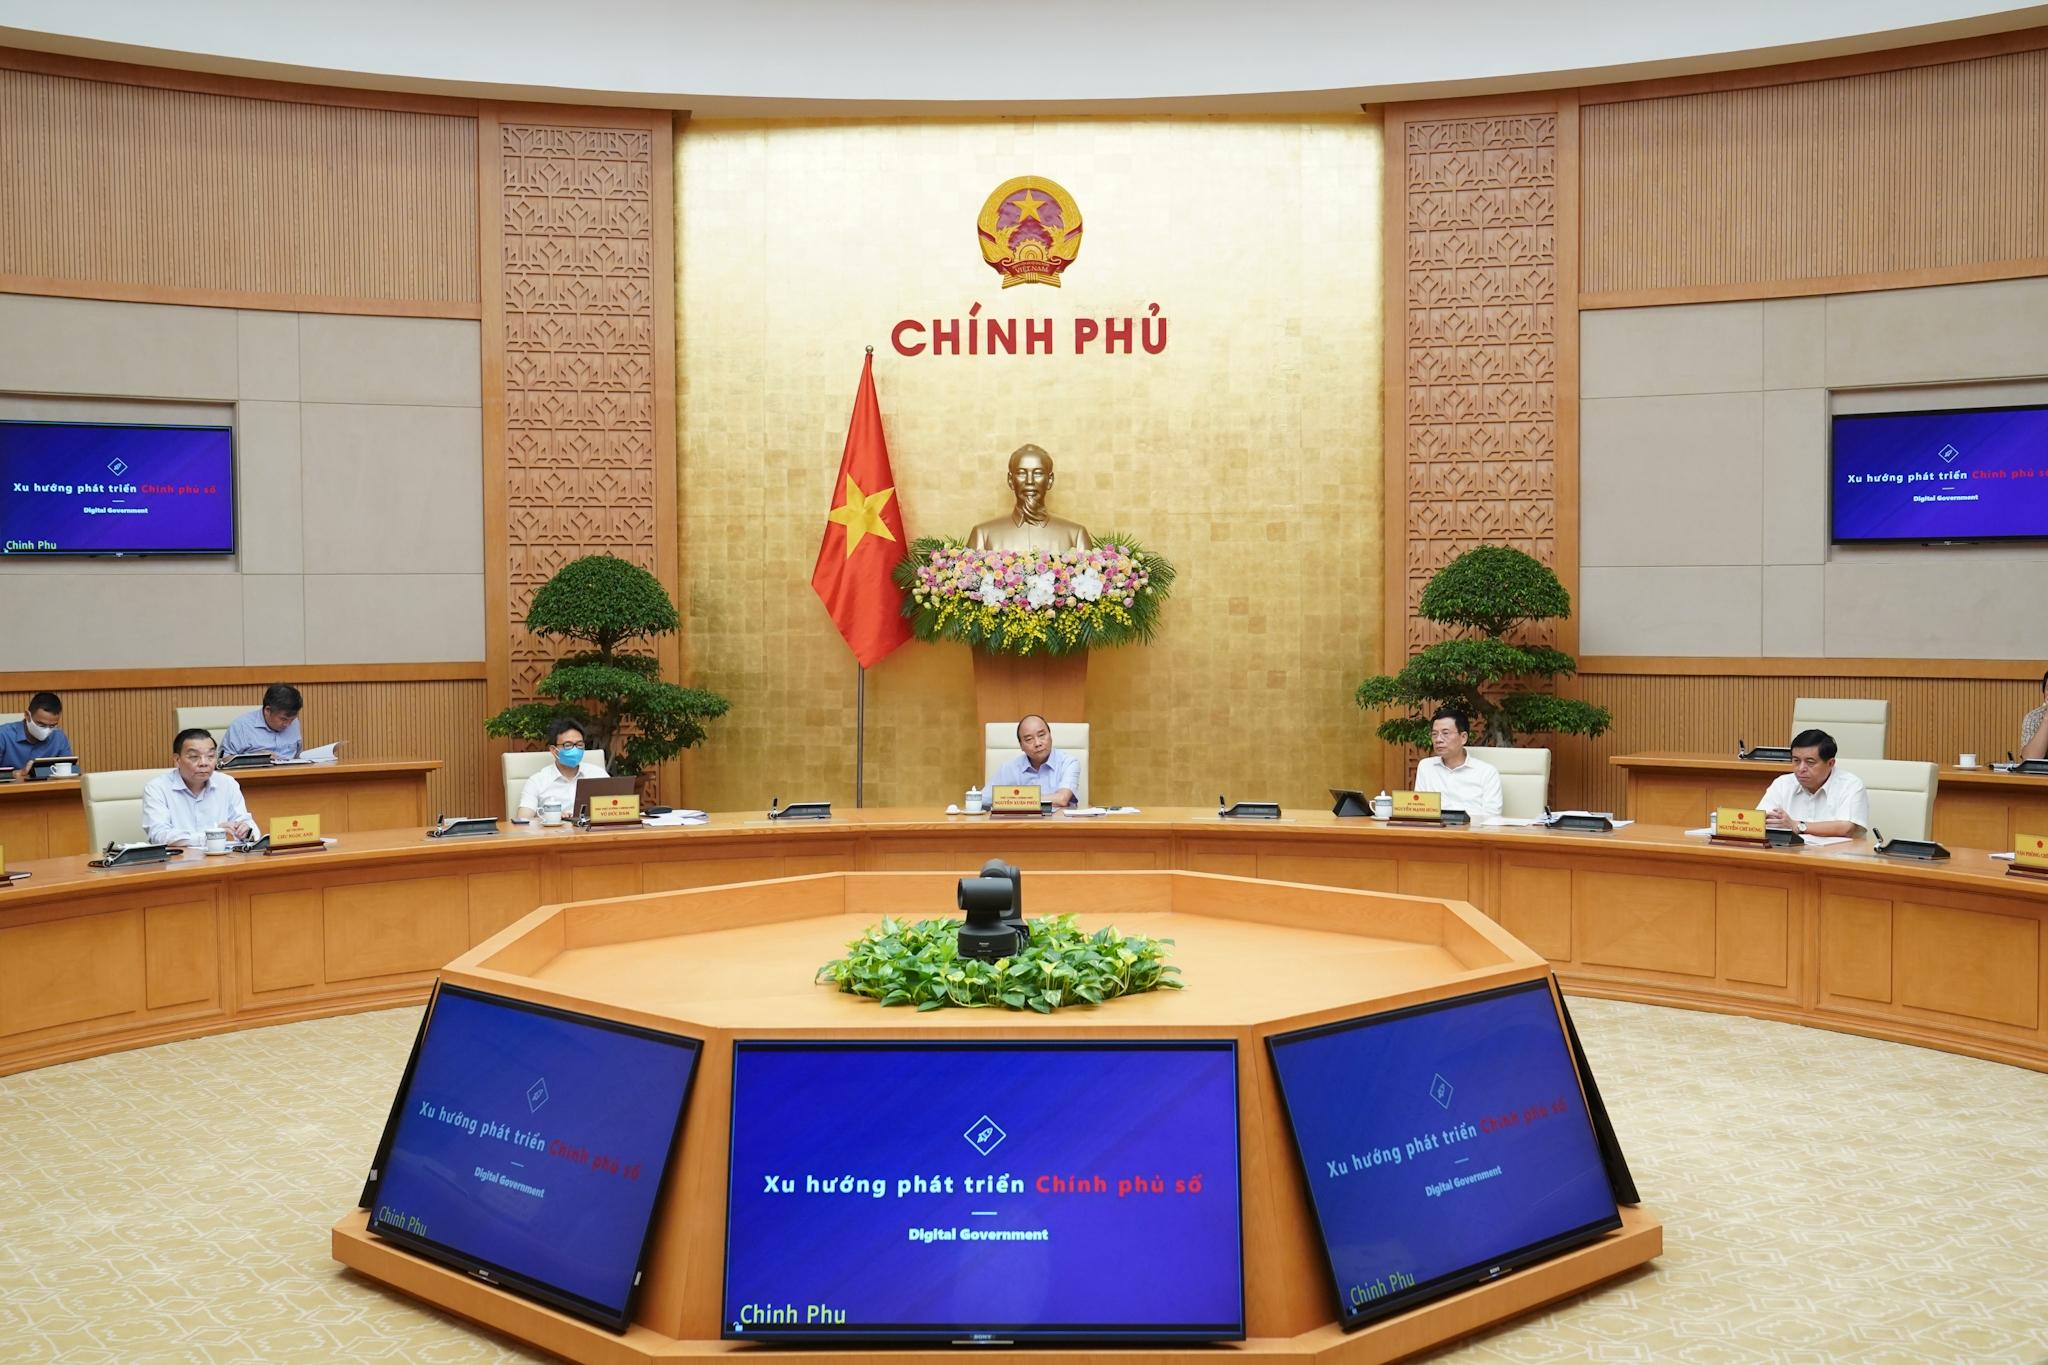 thu tuong chu tri hoi nghi truc tuyen ve chinh phu dien tu